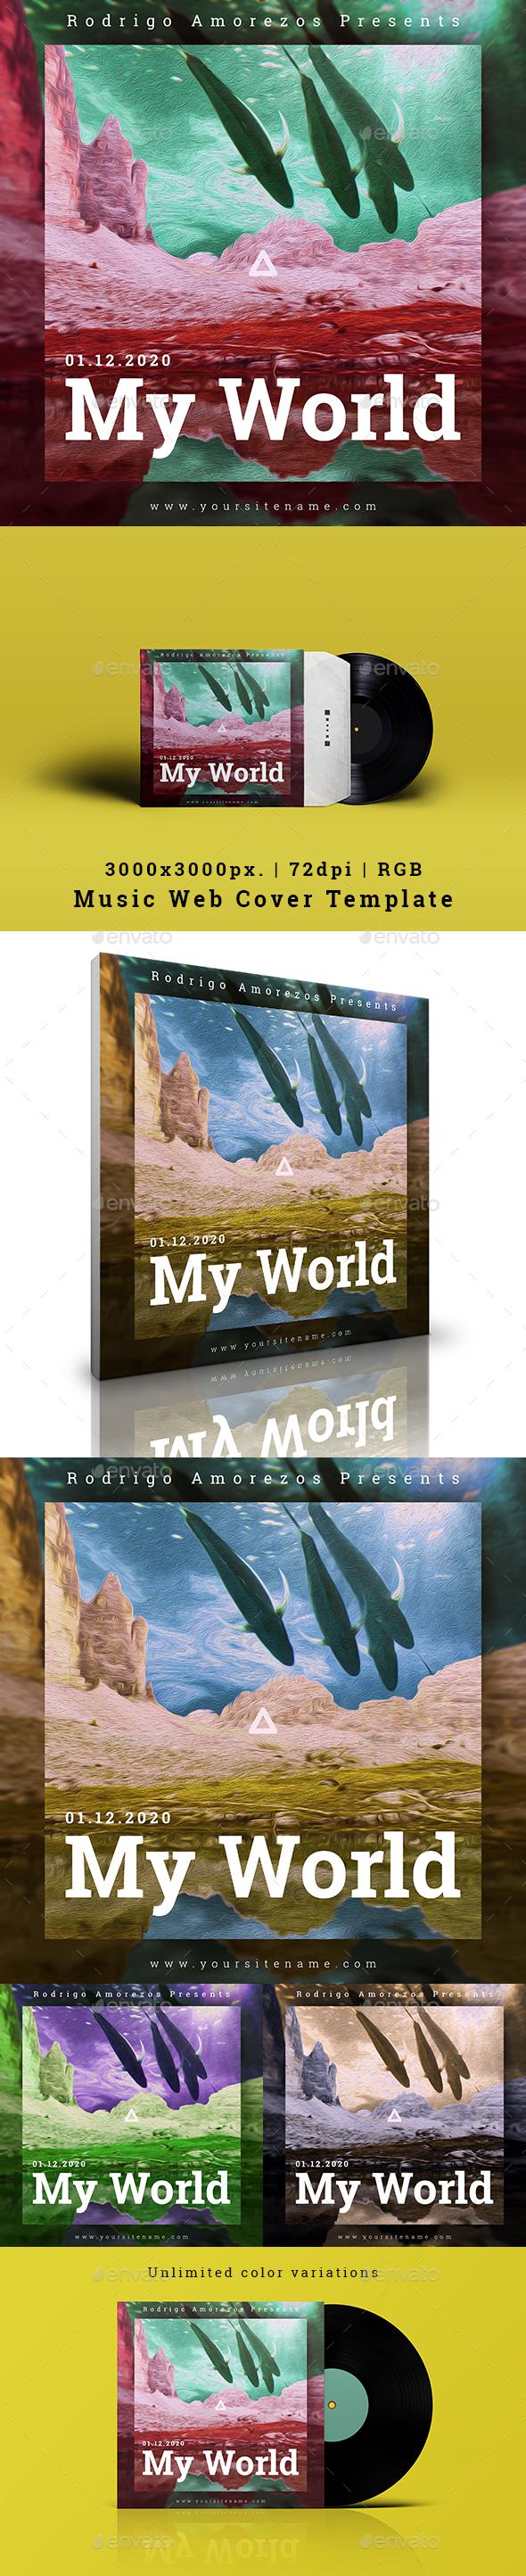 My World - Music Album Cover Fantasy Artwork Template